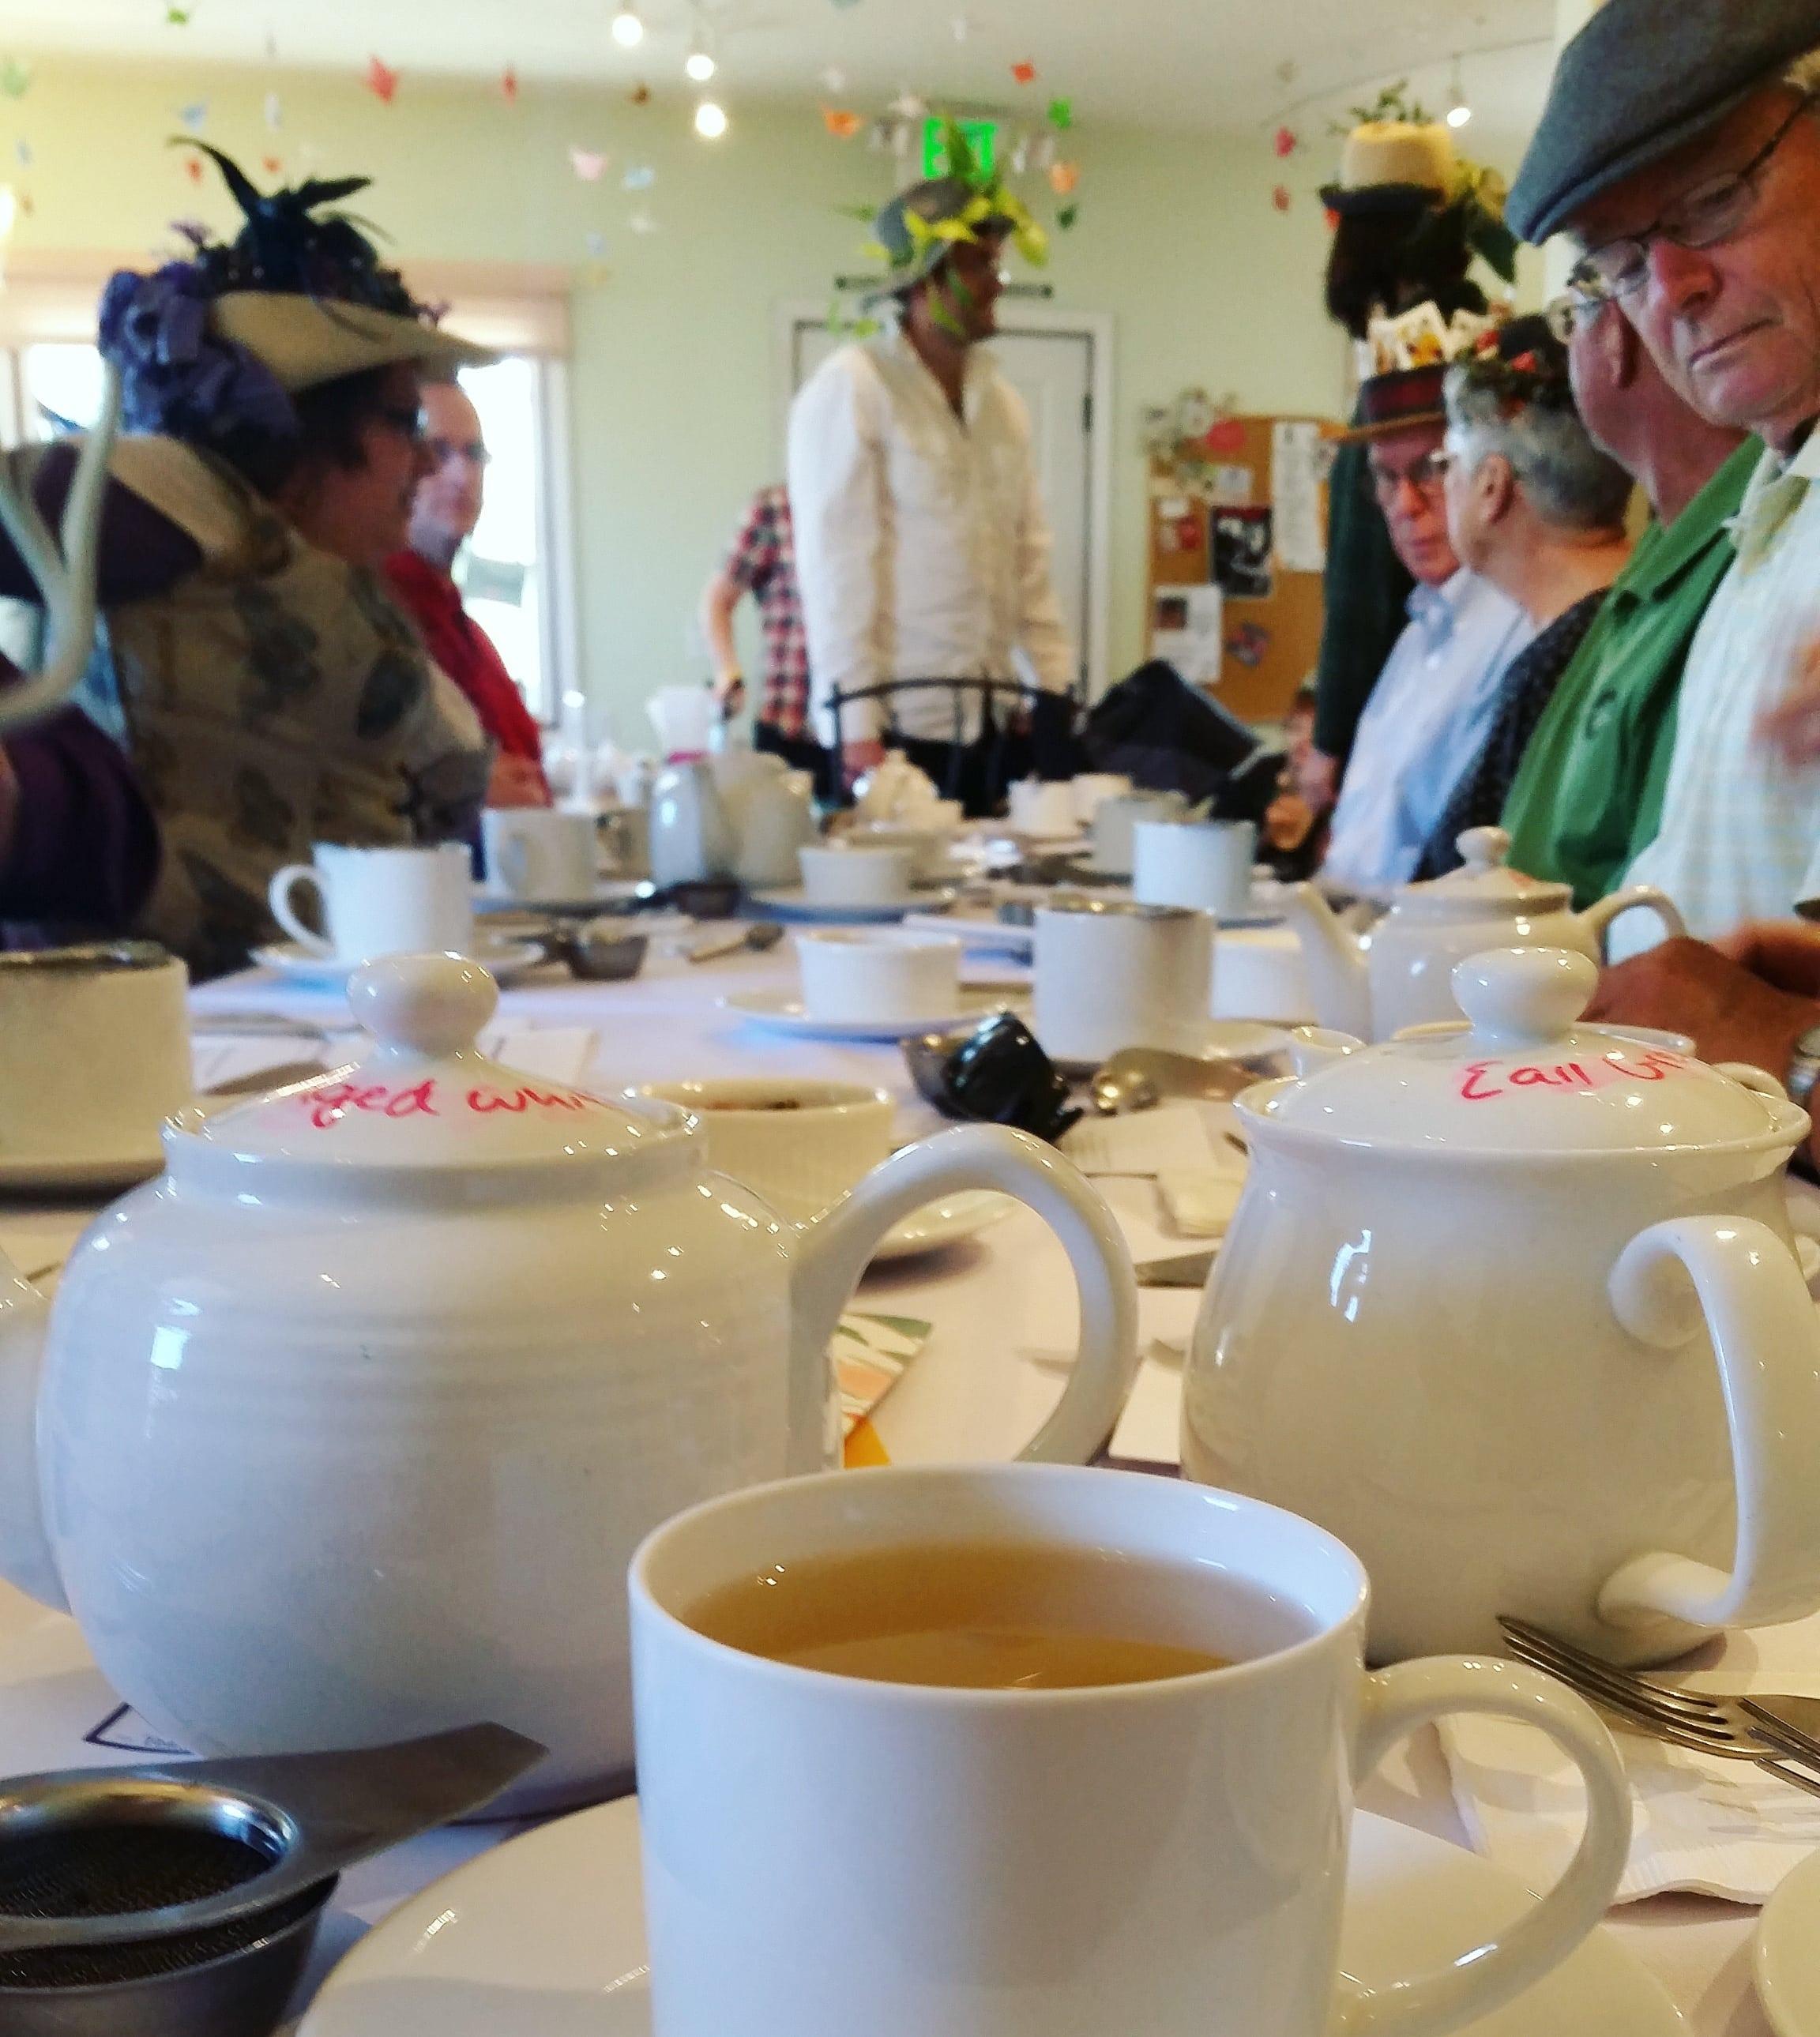 mad-hatter-tea-party-in-progress